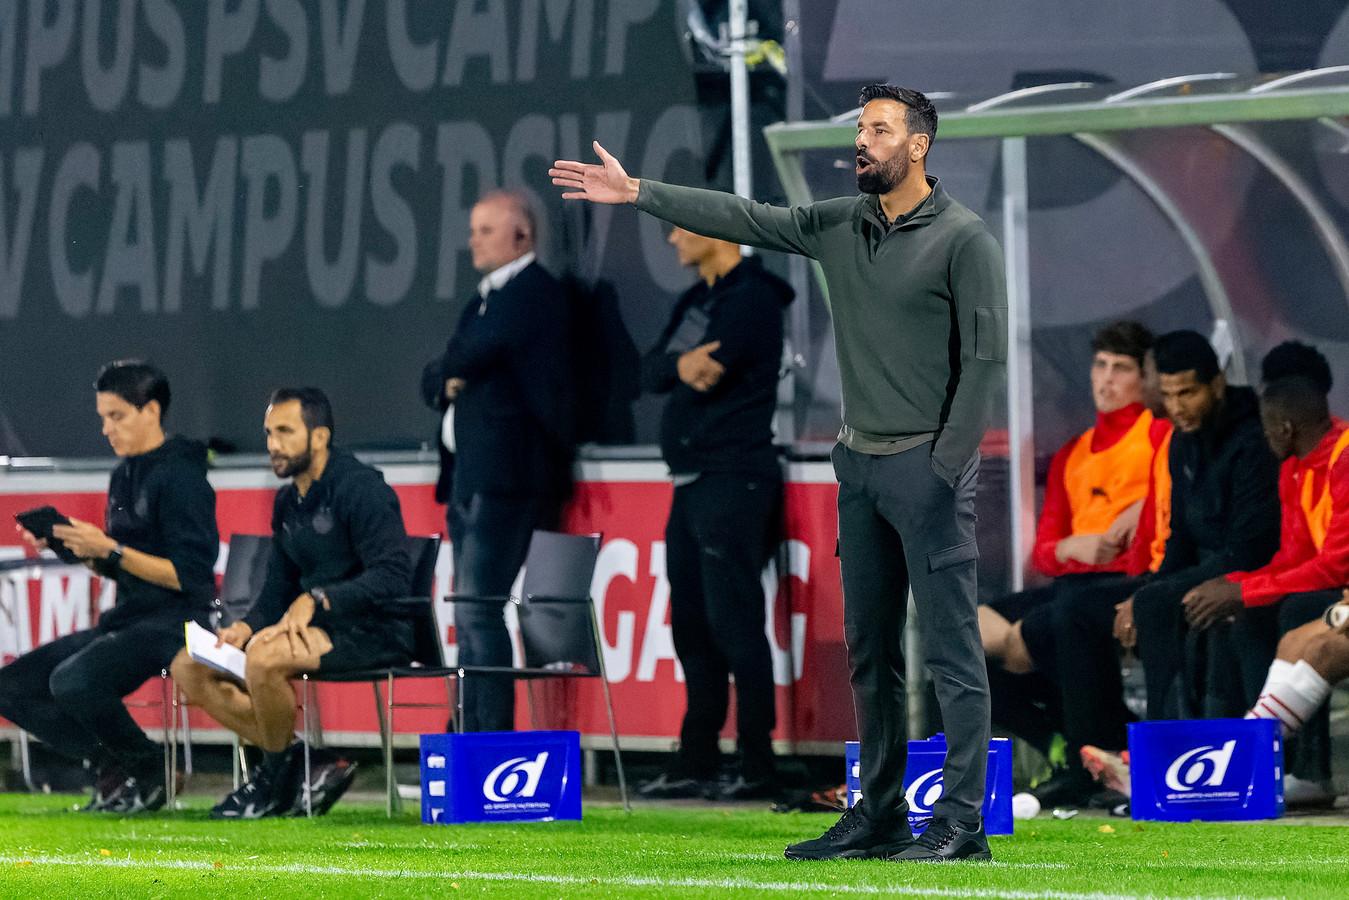 Trainer Ruud van Nistelrooy zag Jong PSV met 3-1 winnen van Jong Ajax.